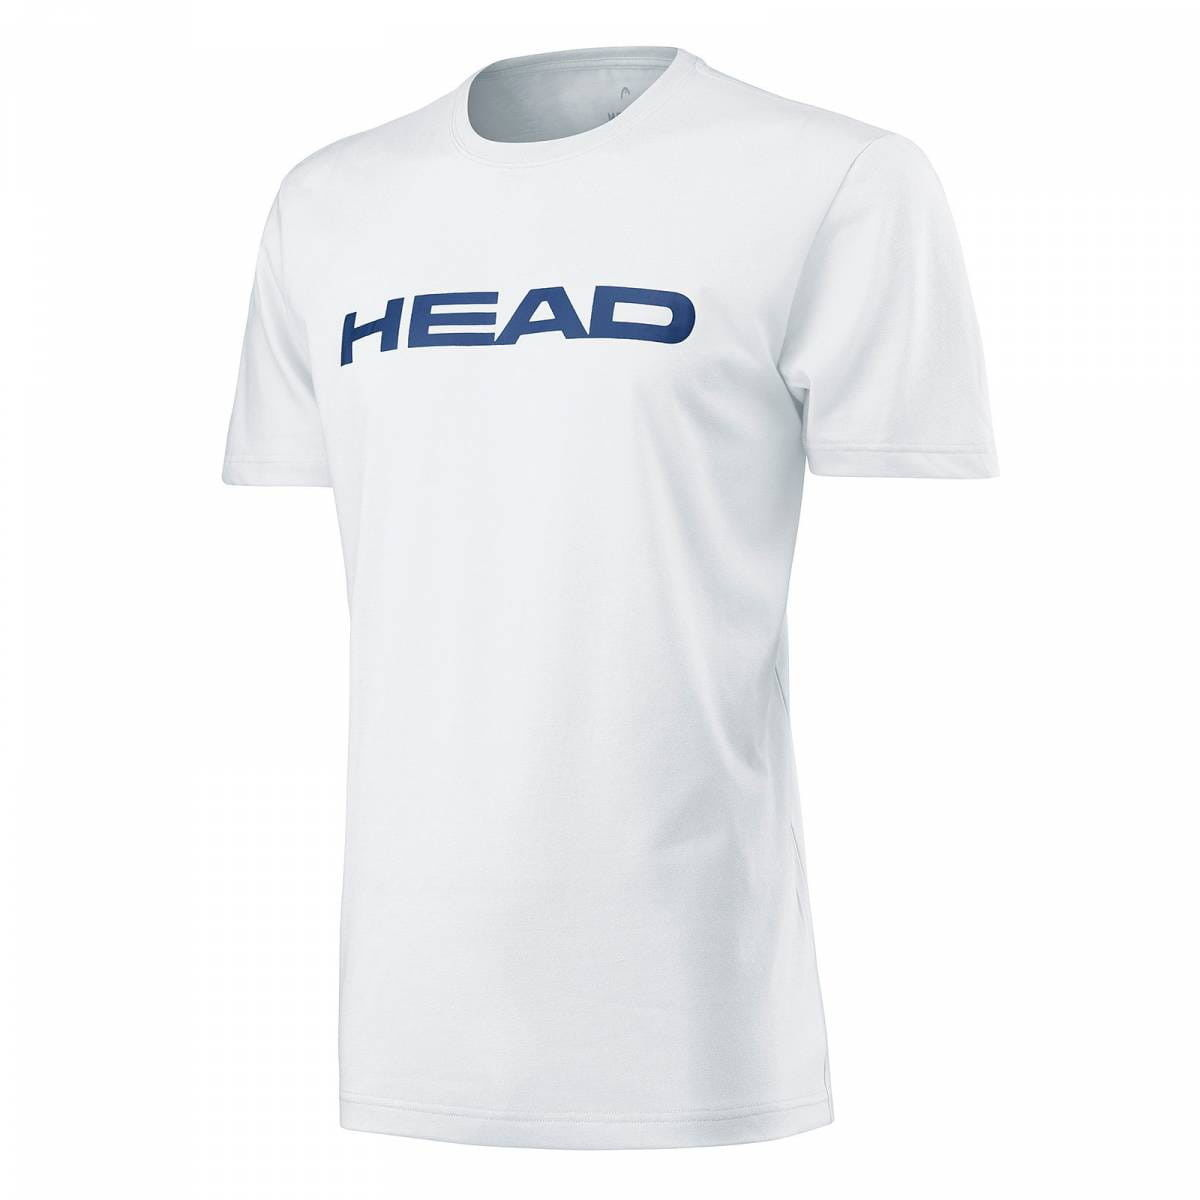 Head Transition Ivan Jr T-shirt - white/navy